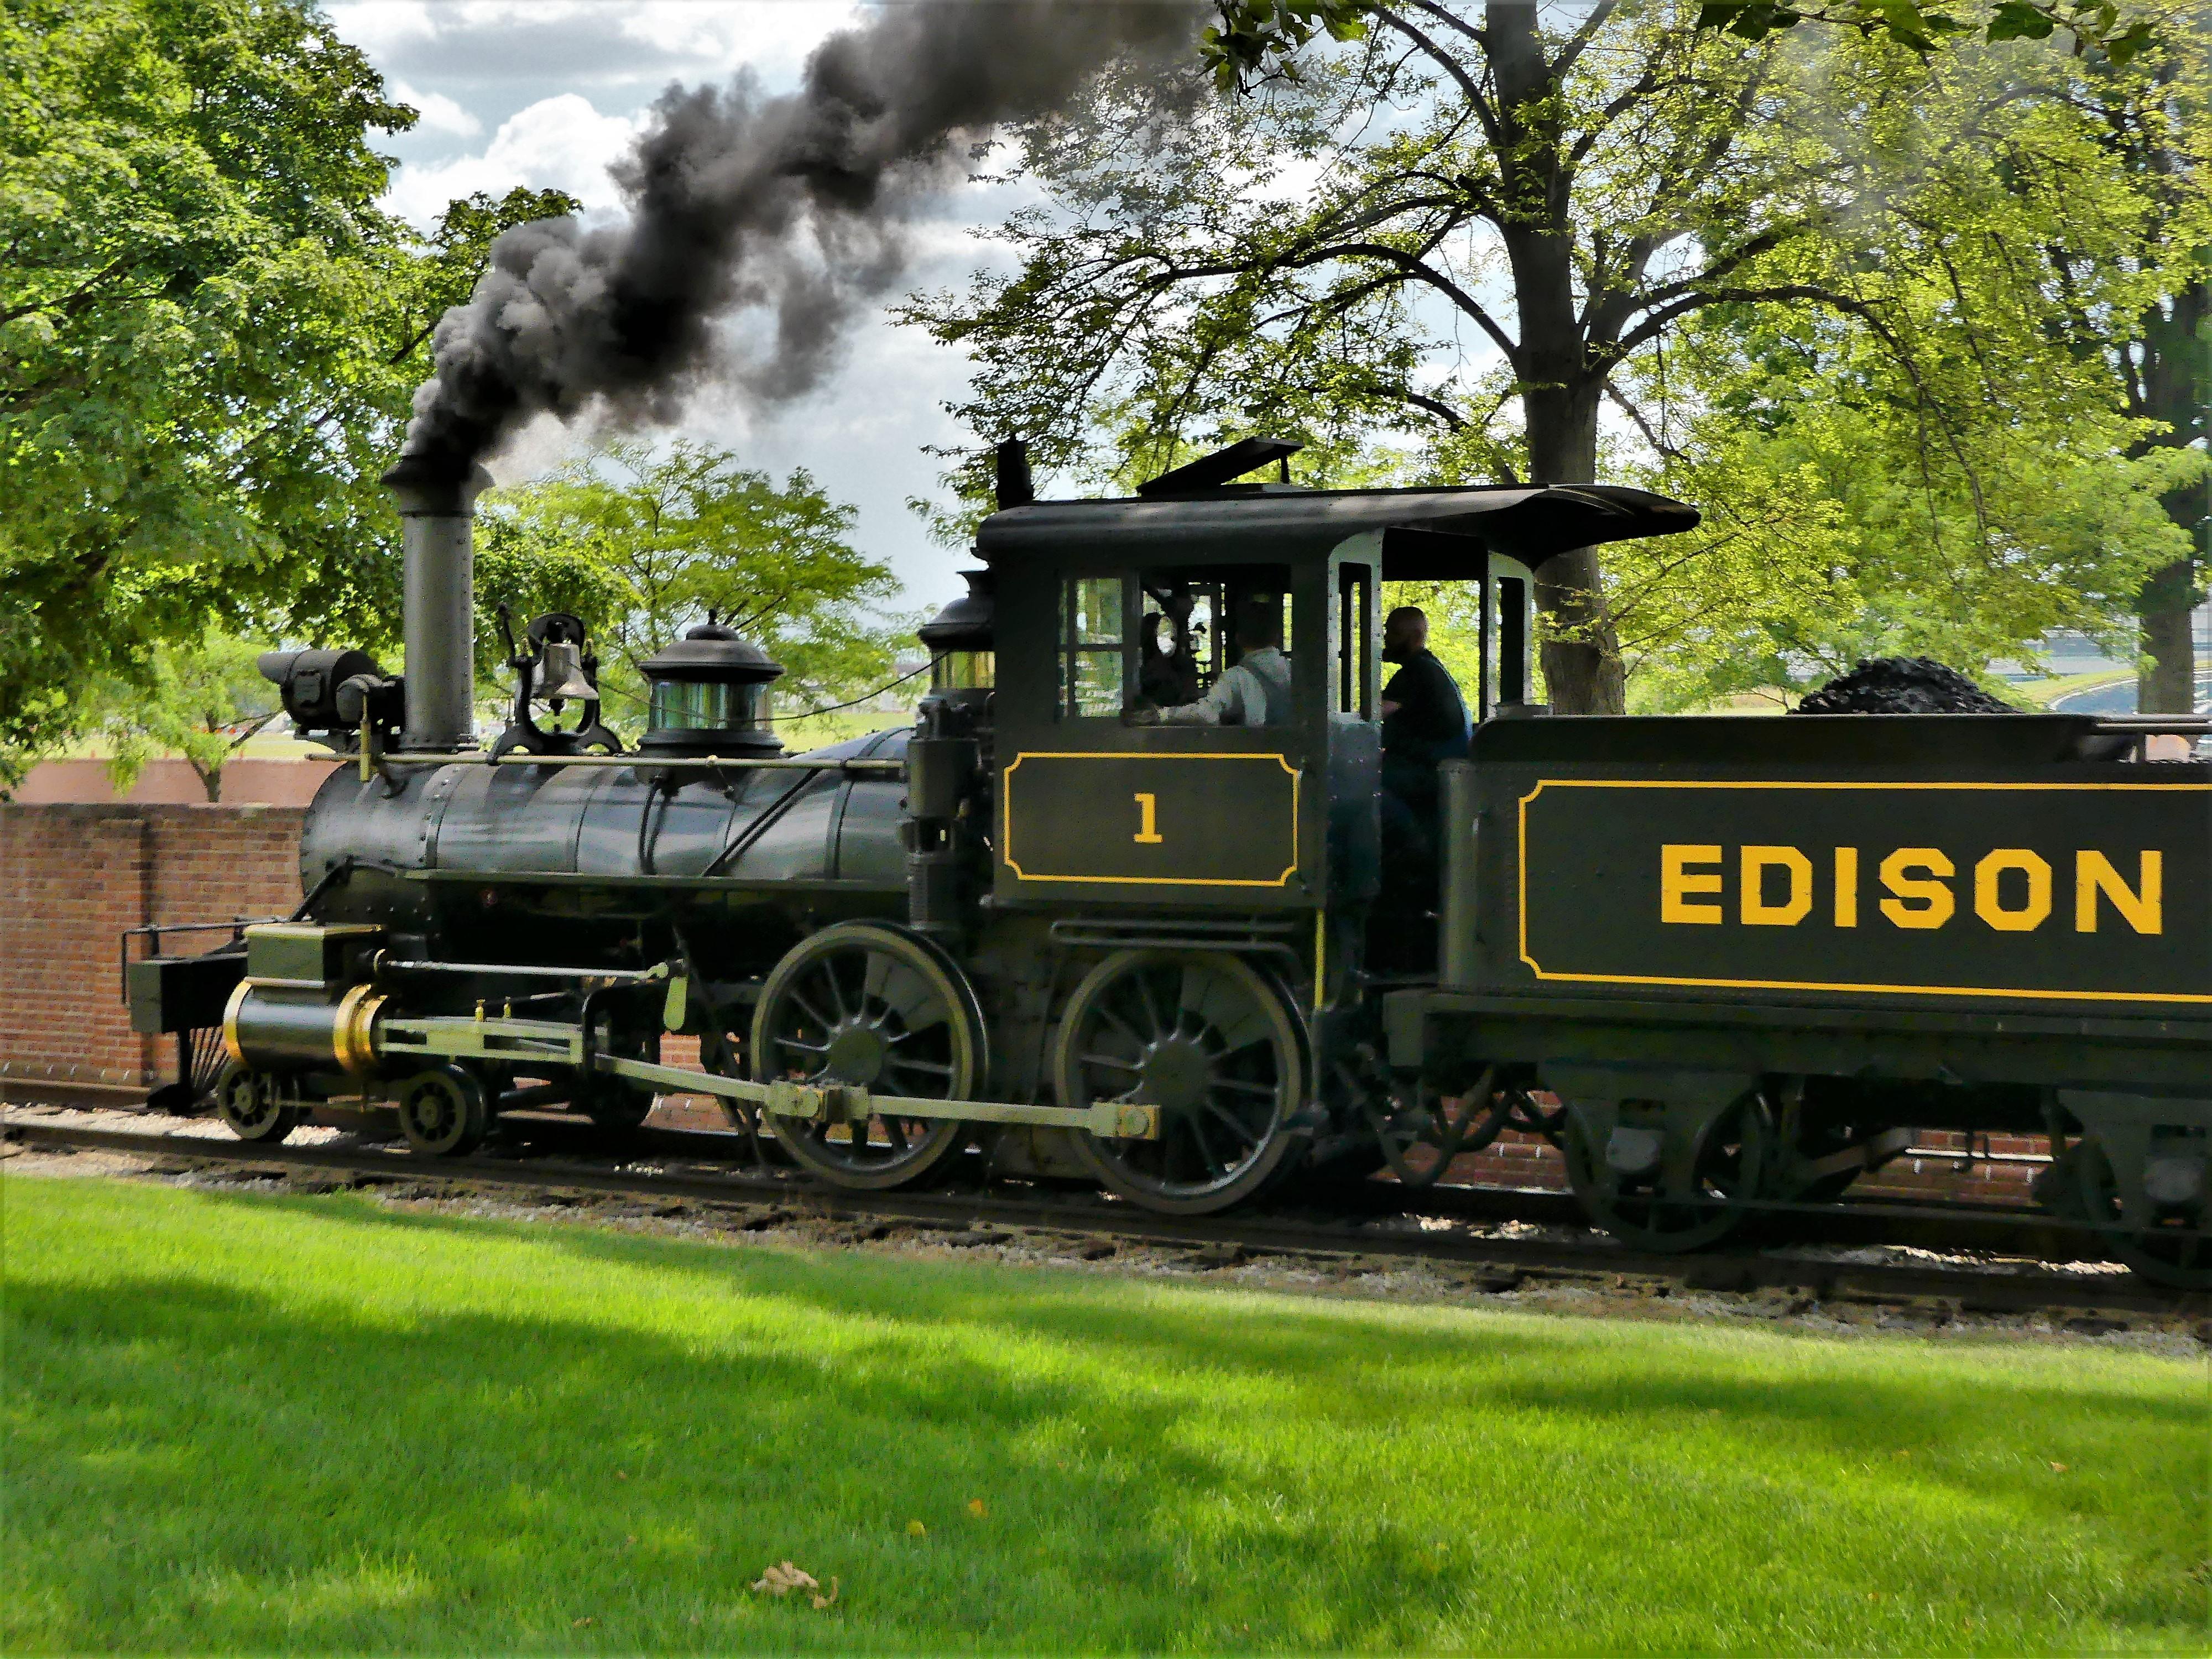 Edison 1